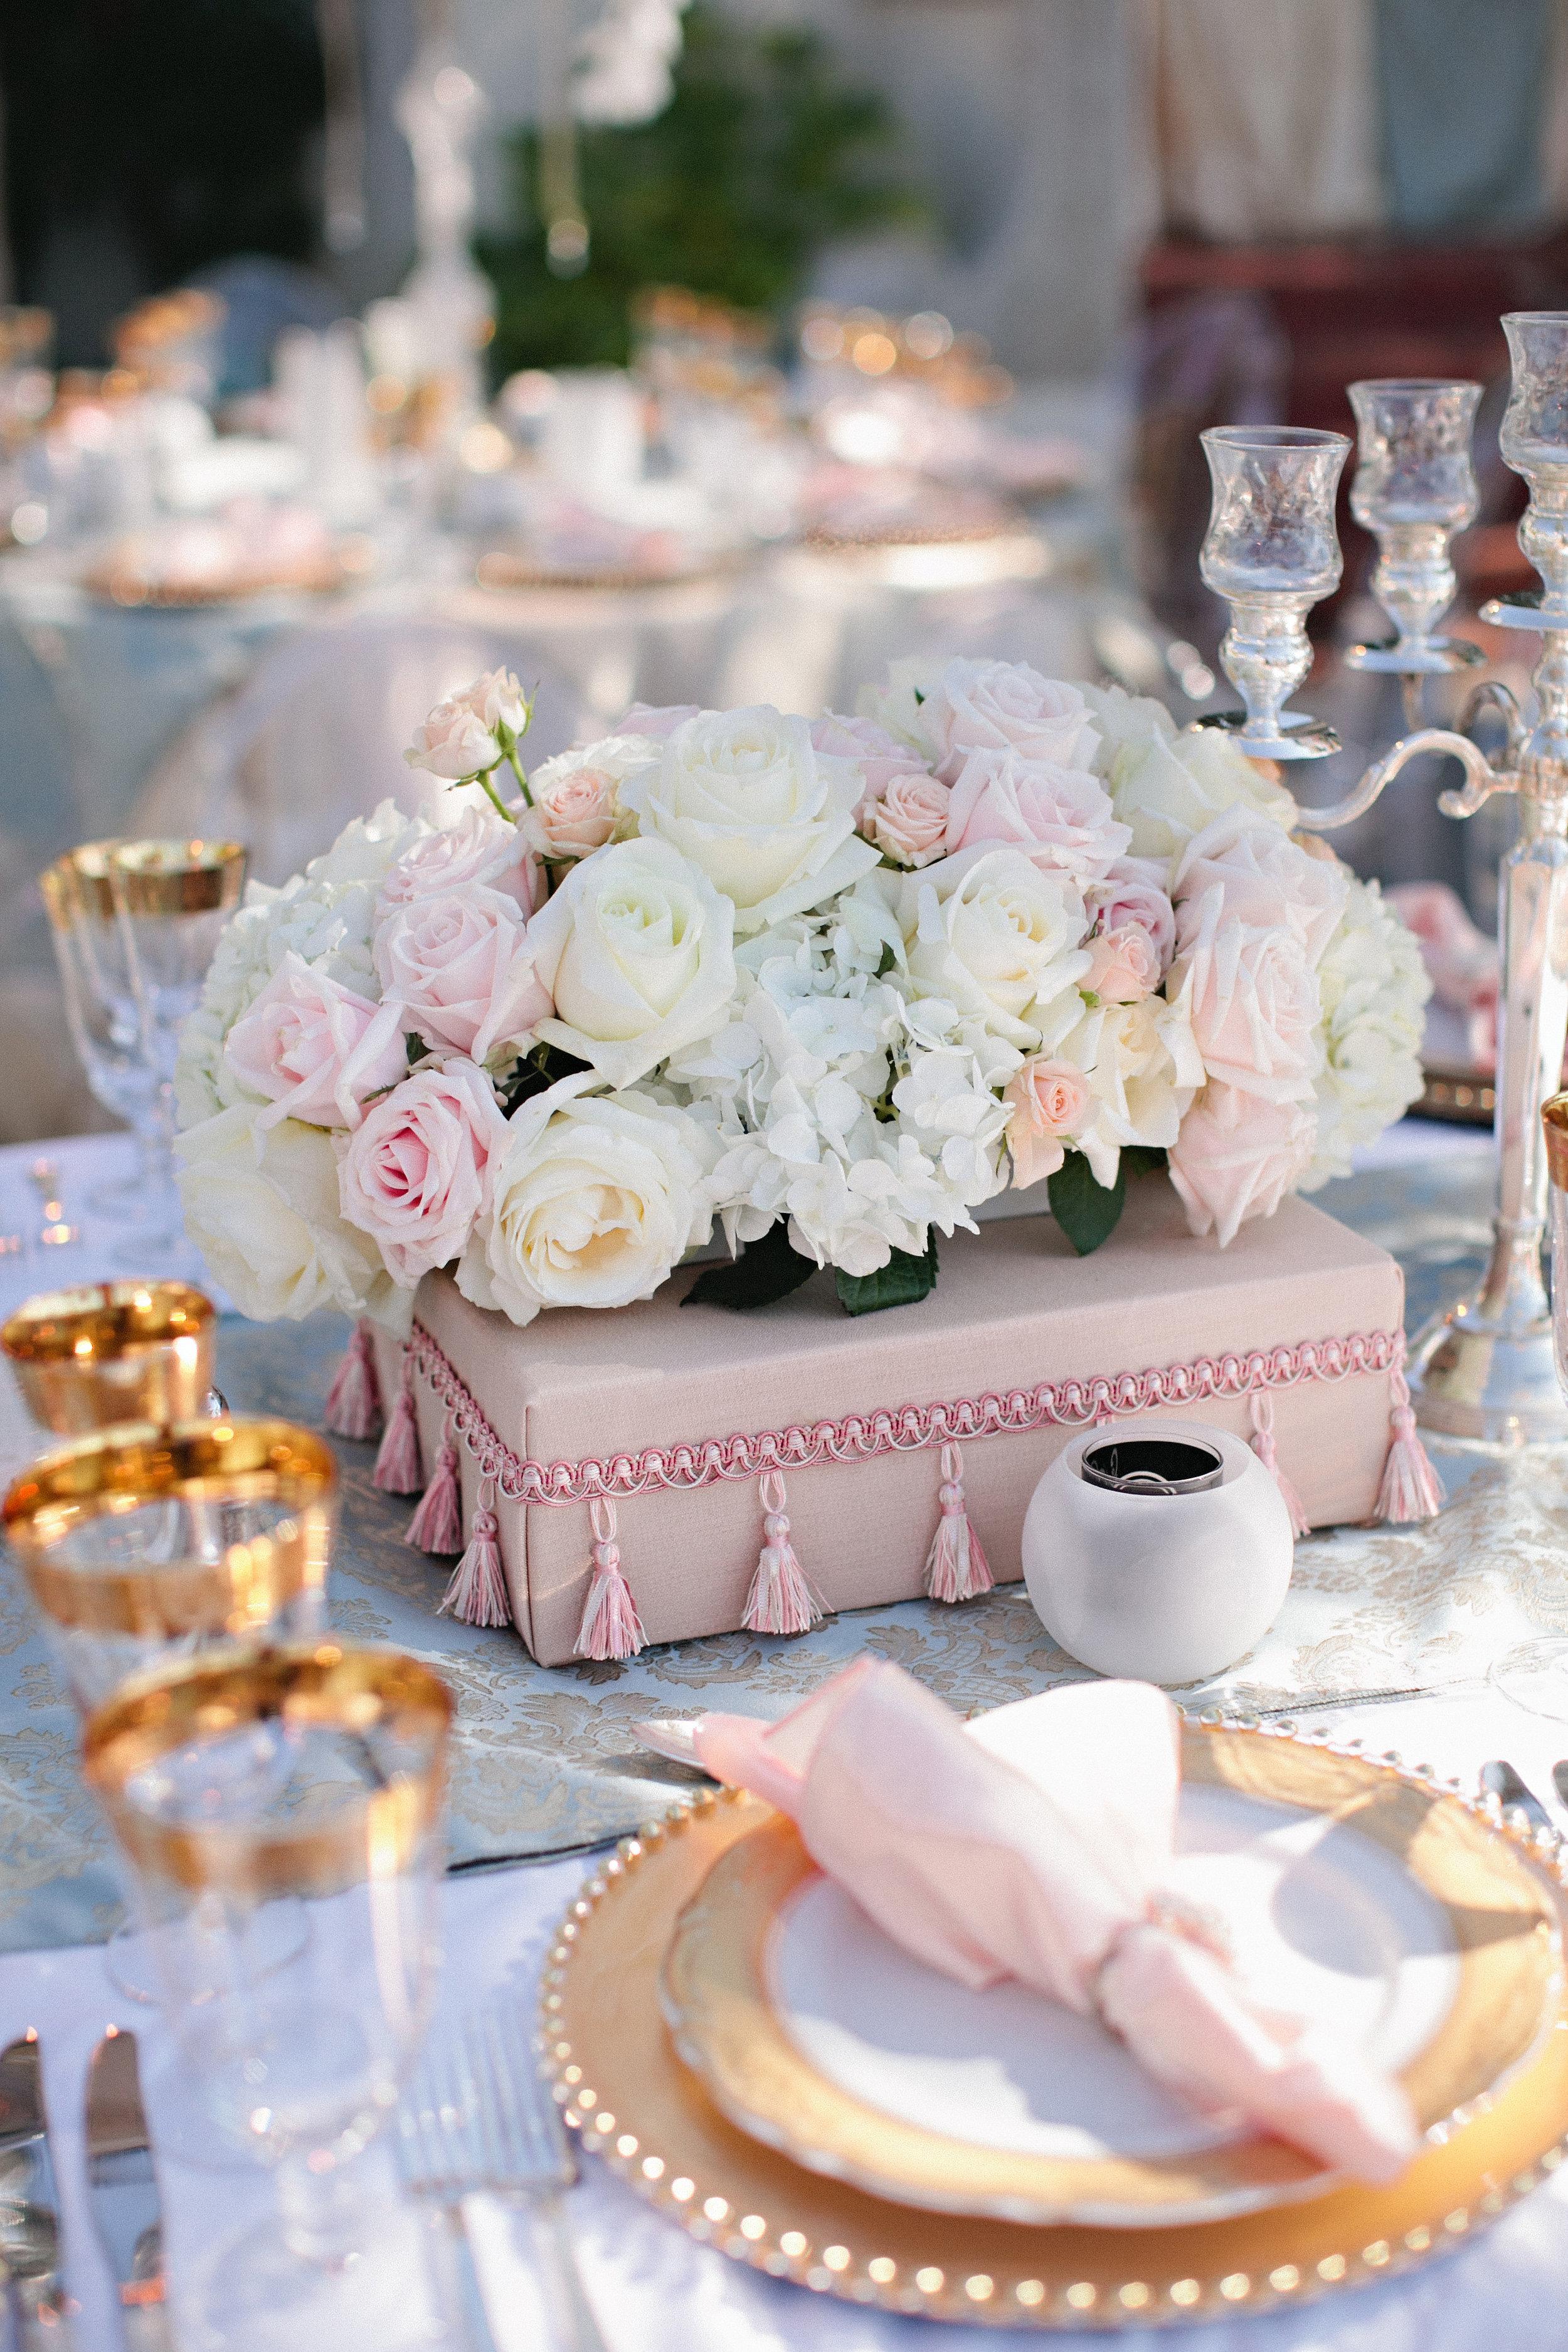 9117_linda_vu_wedding-1616985612-O.jpg